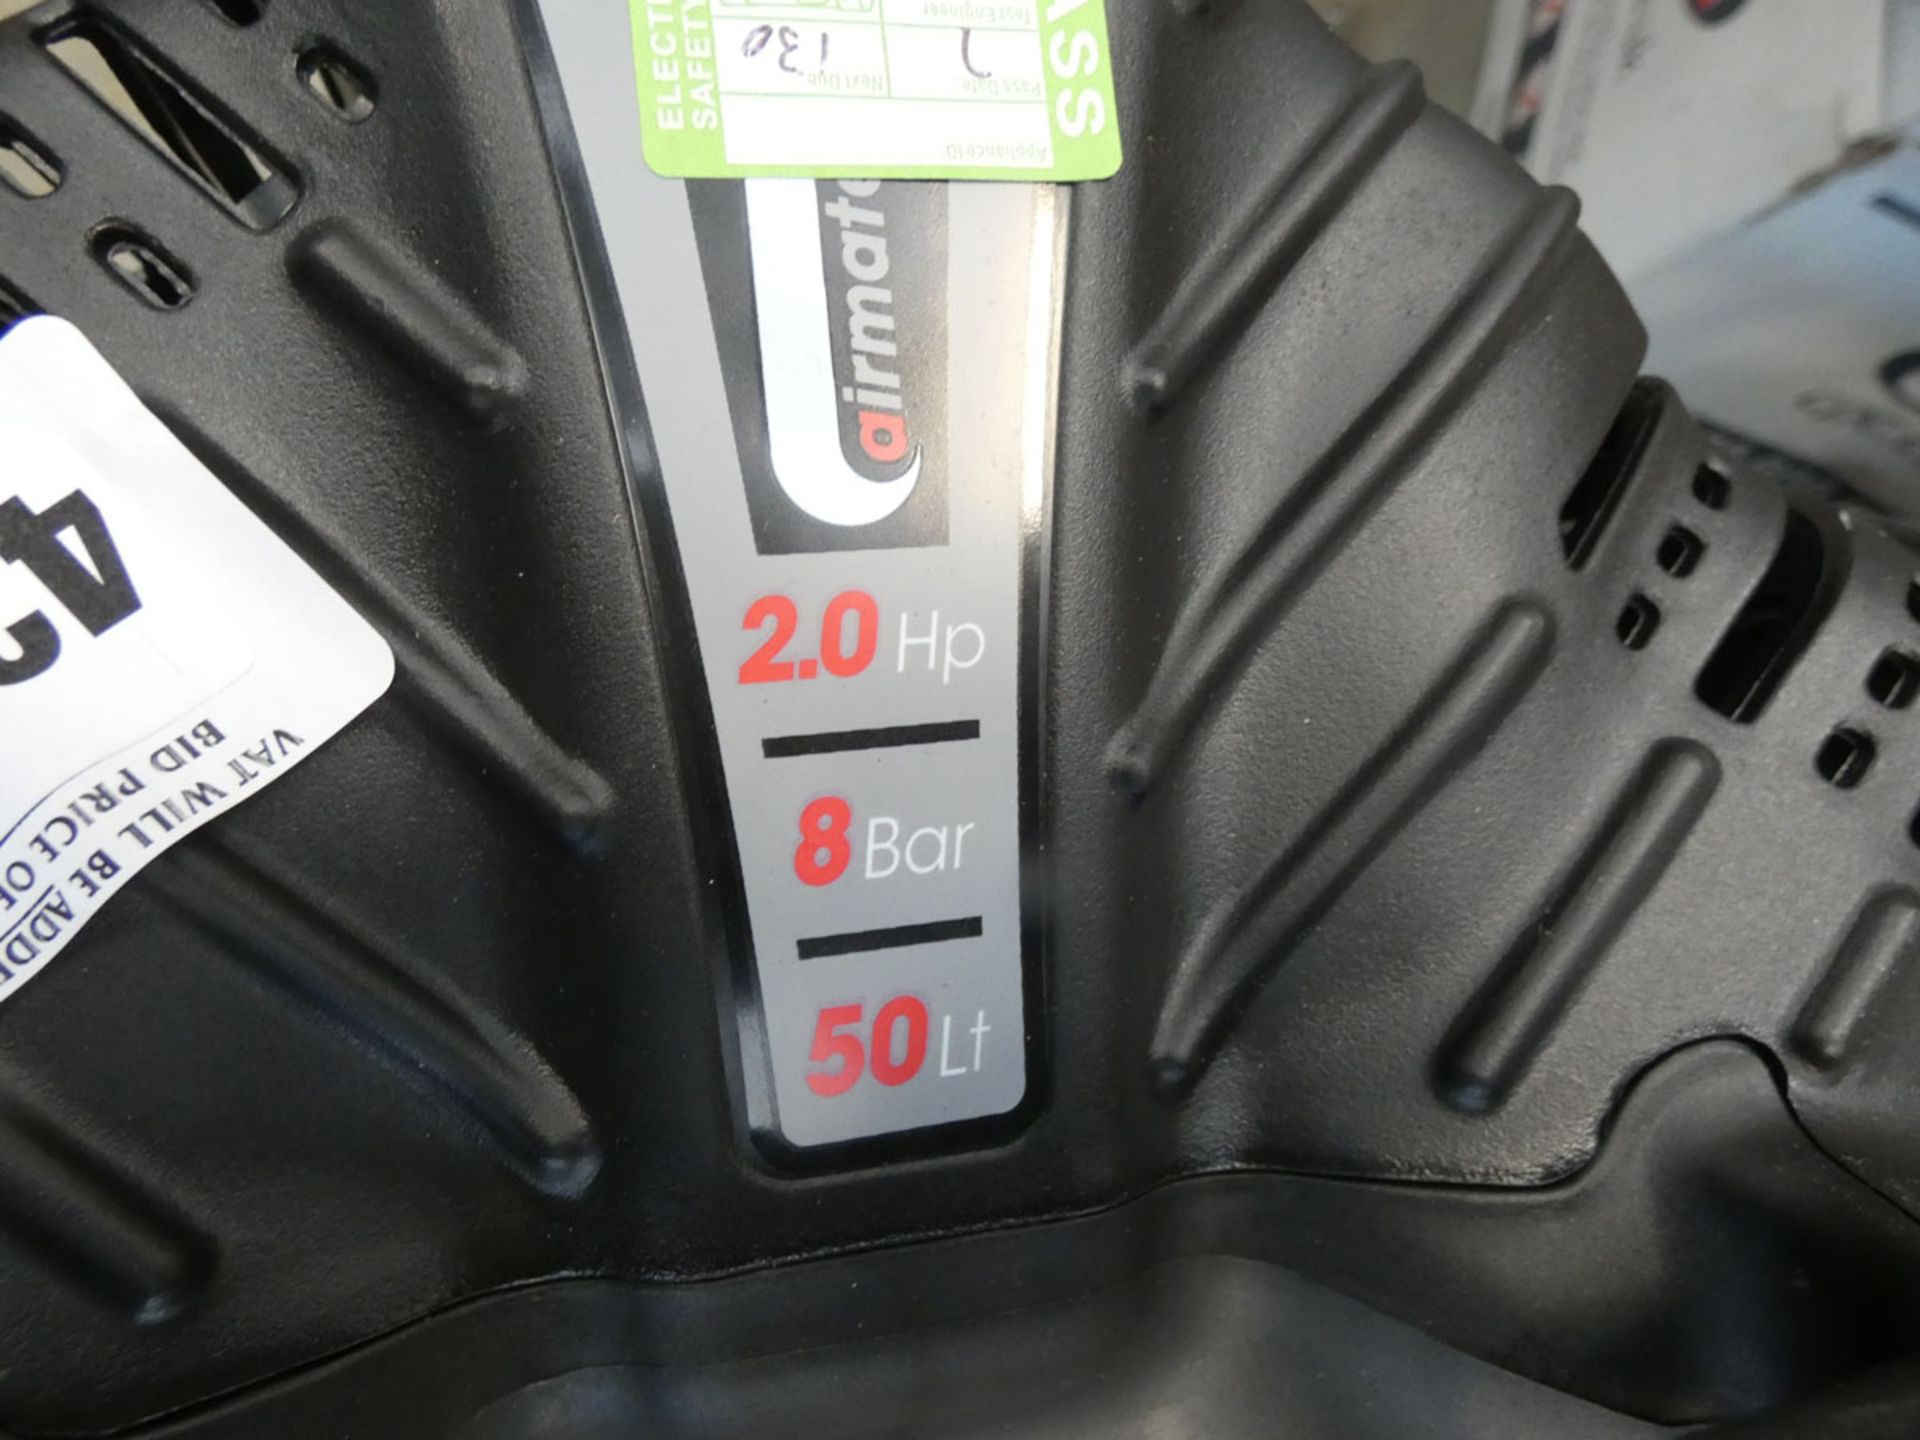 SIP 2.0hp upright compressor - Image 4 of 4